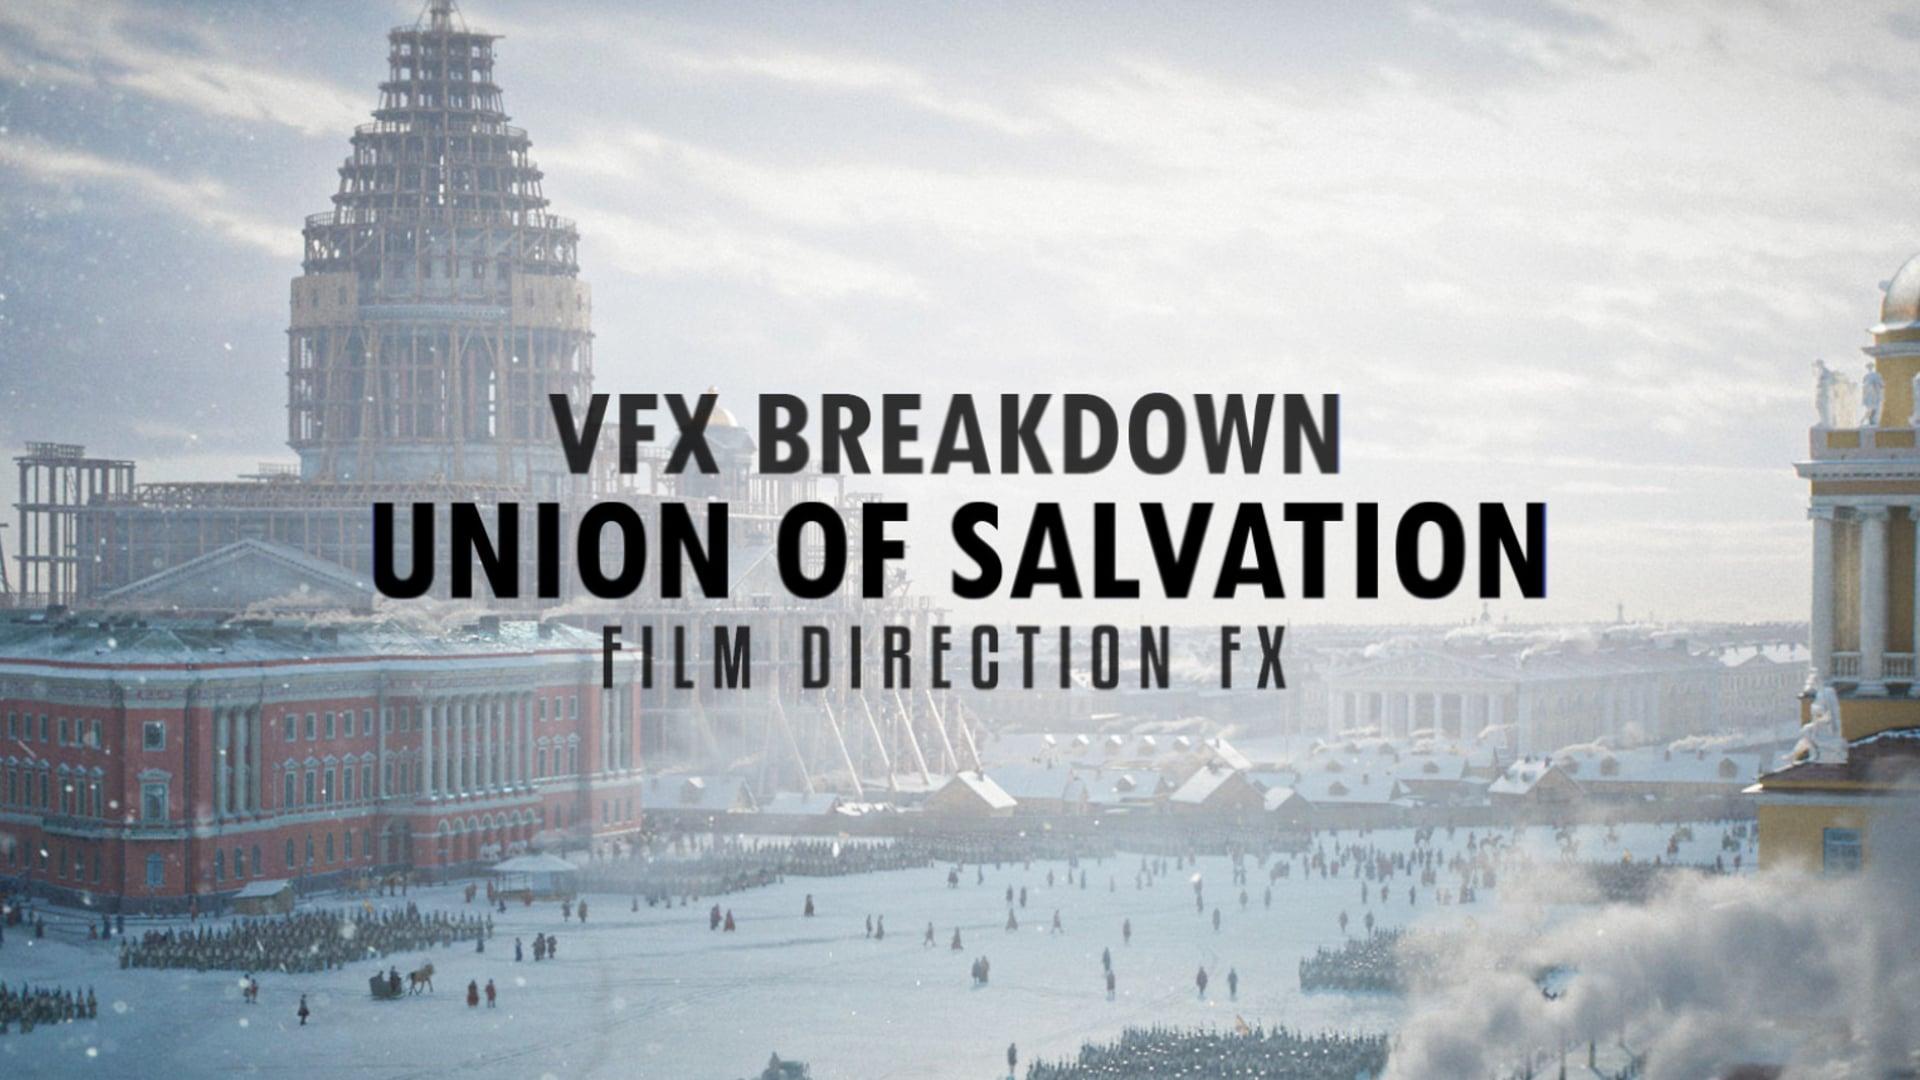 vfx breakdown Union of Salvation